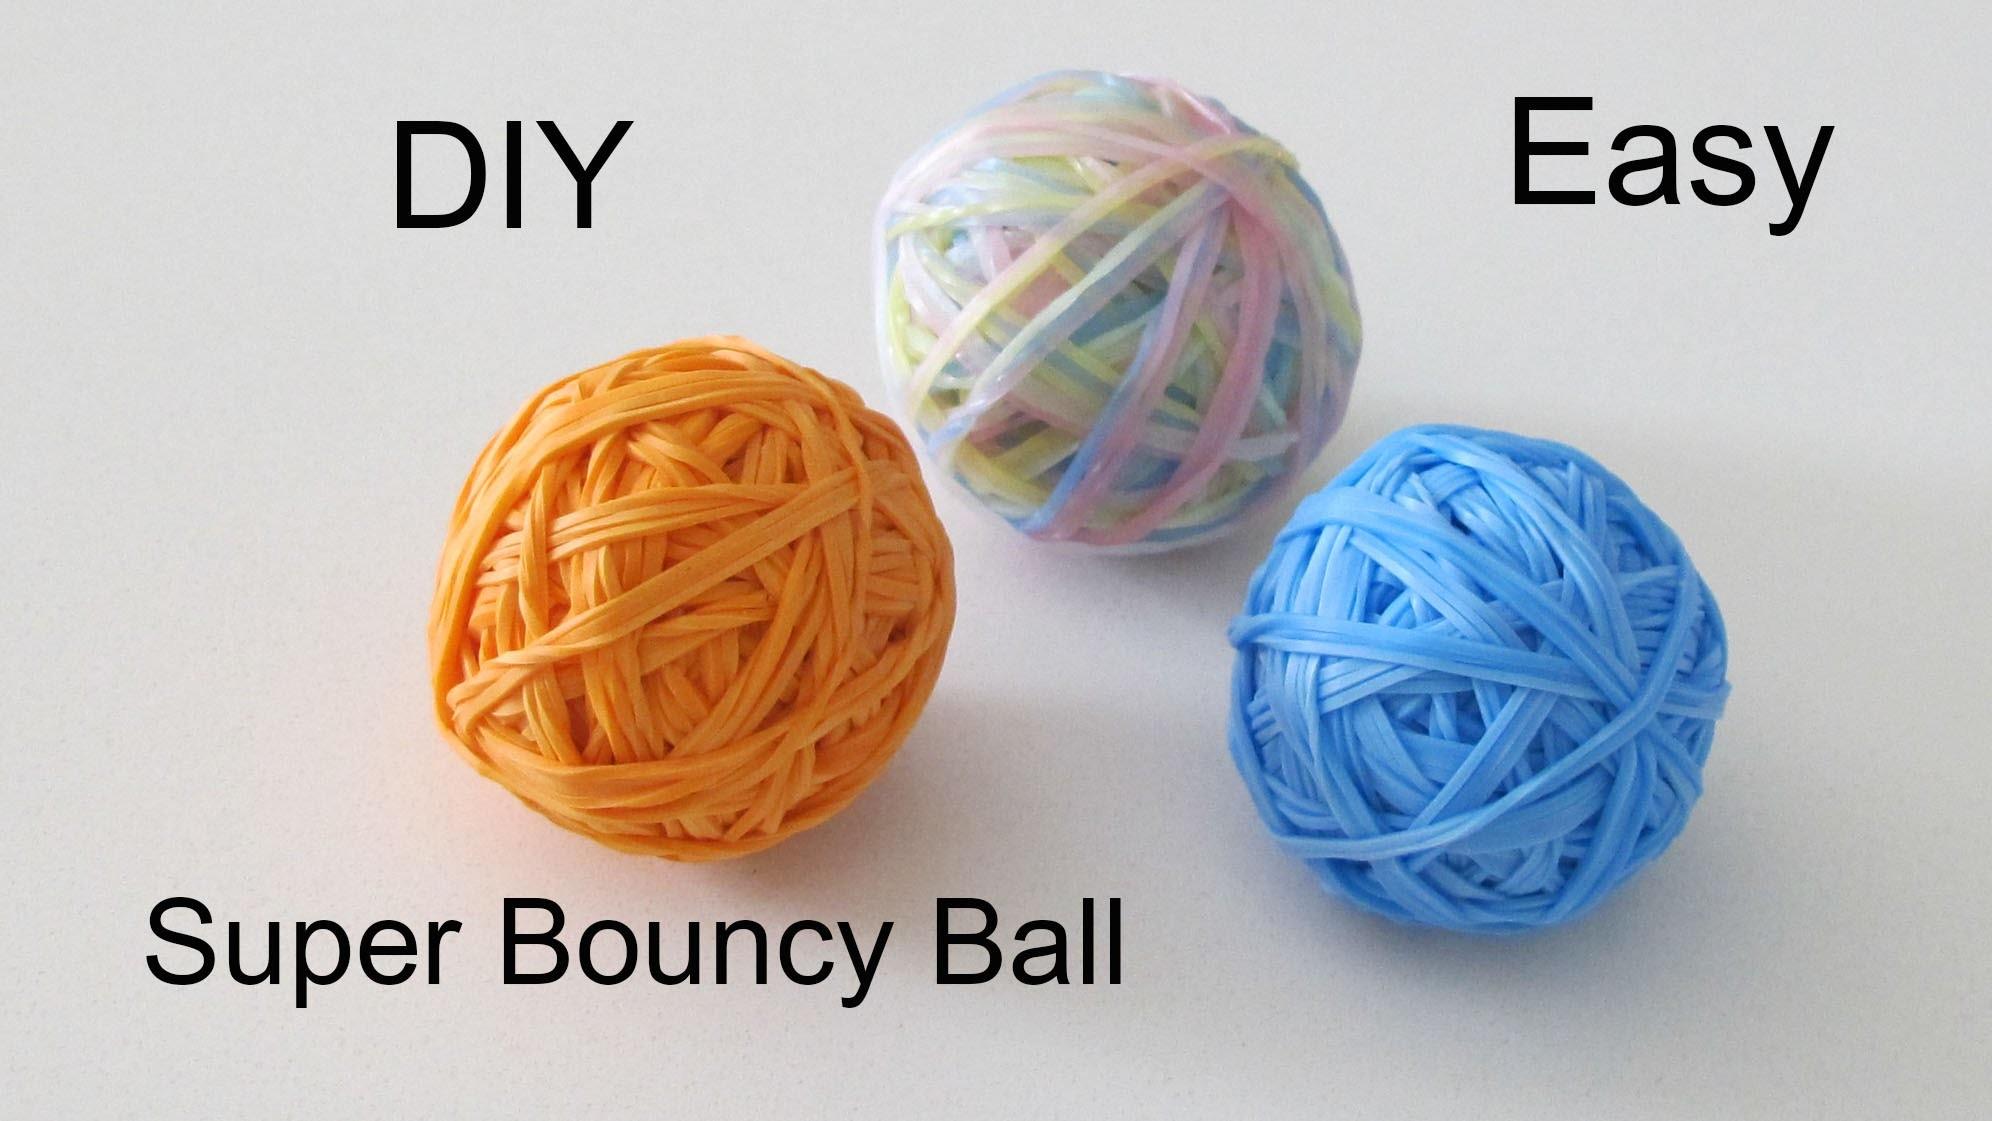 DIY: Super Bouncy Ball.Rainbow Loom Bouncing Ball 3D Jump Up to 12+ Feet